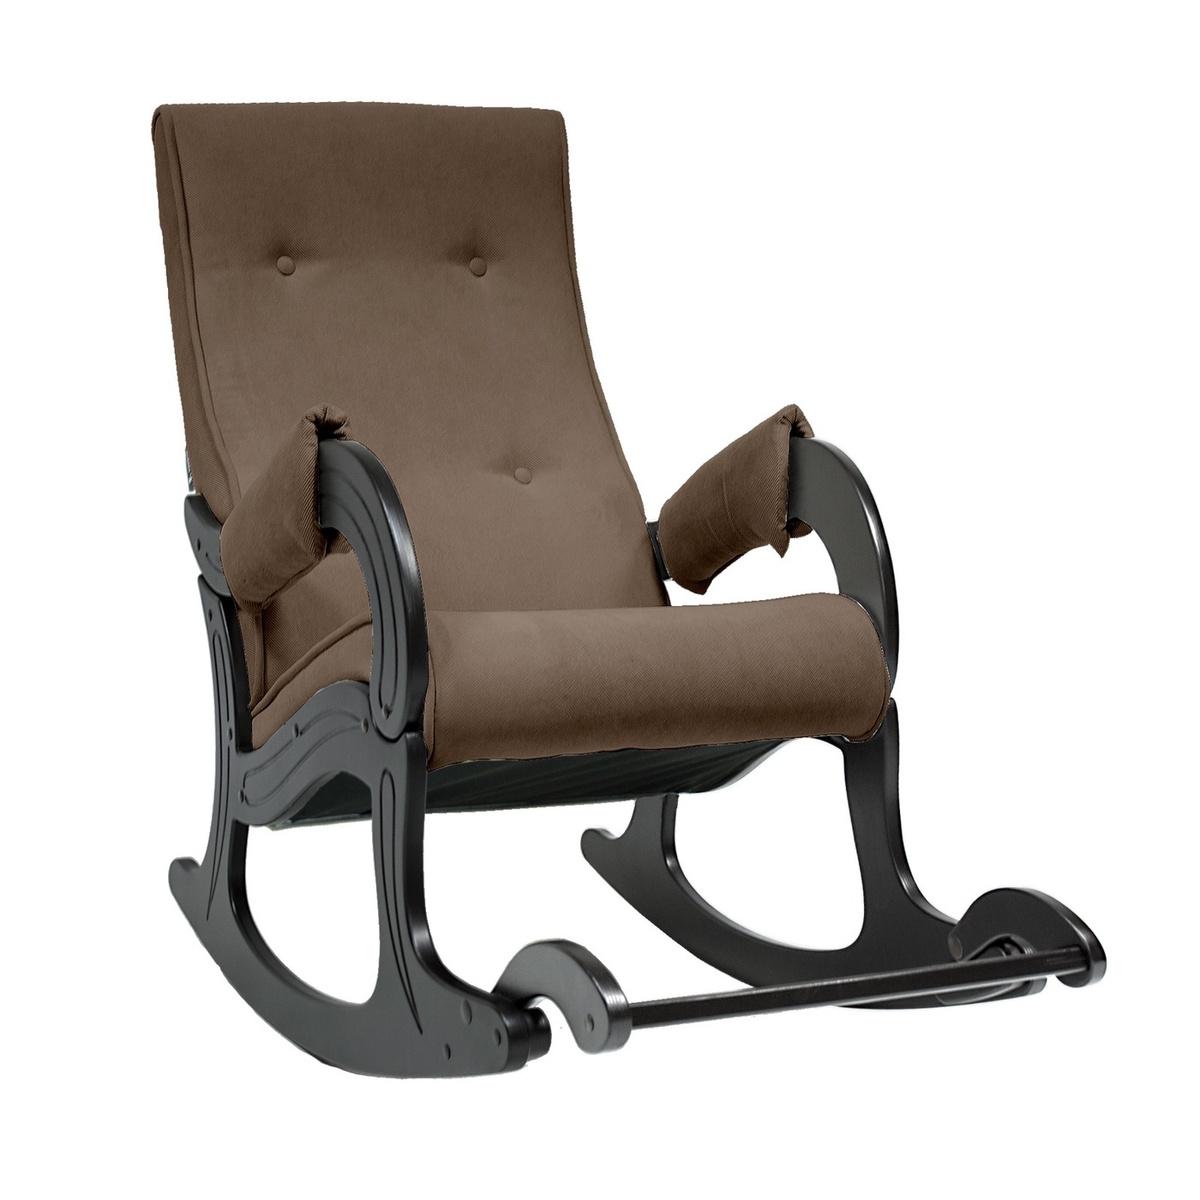 Кресло-качалка Модель 707, 58х107х90 см #1